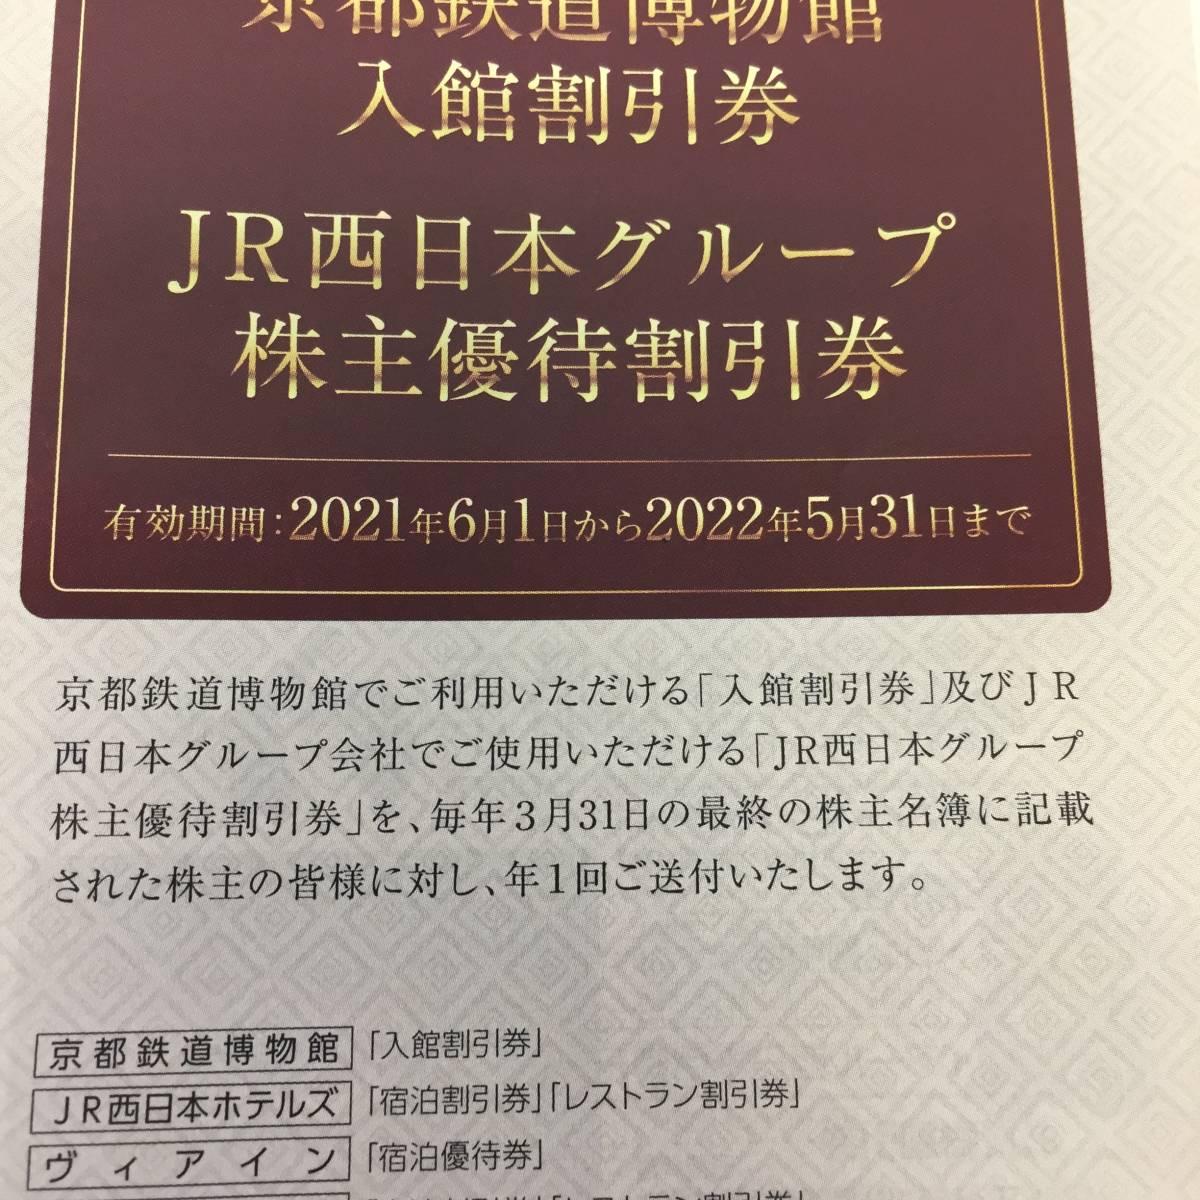 【1073364】JR西日本グループ株主優待割引券 鉄道博物館入館割引券☆2022年5月31日まで_画像5